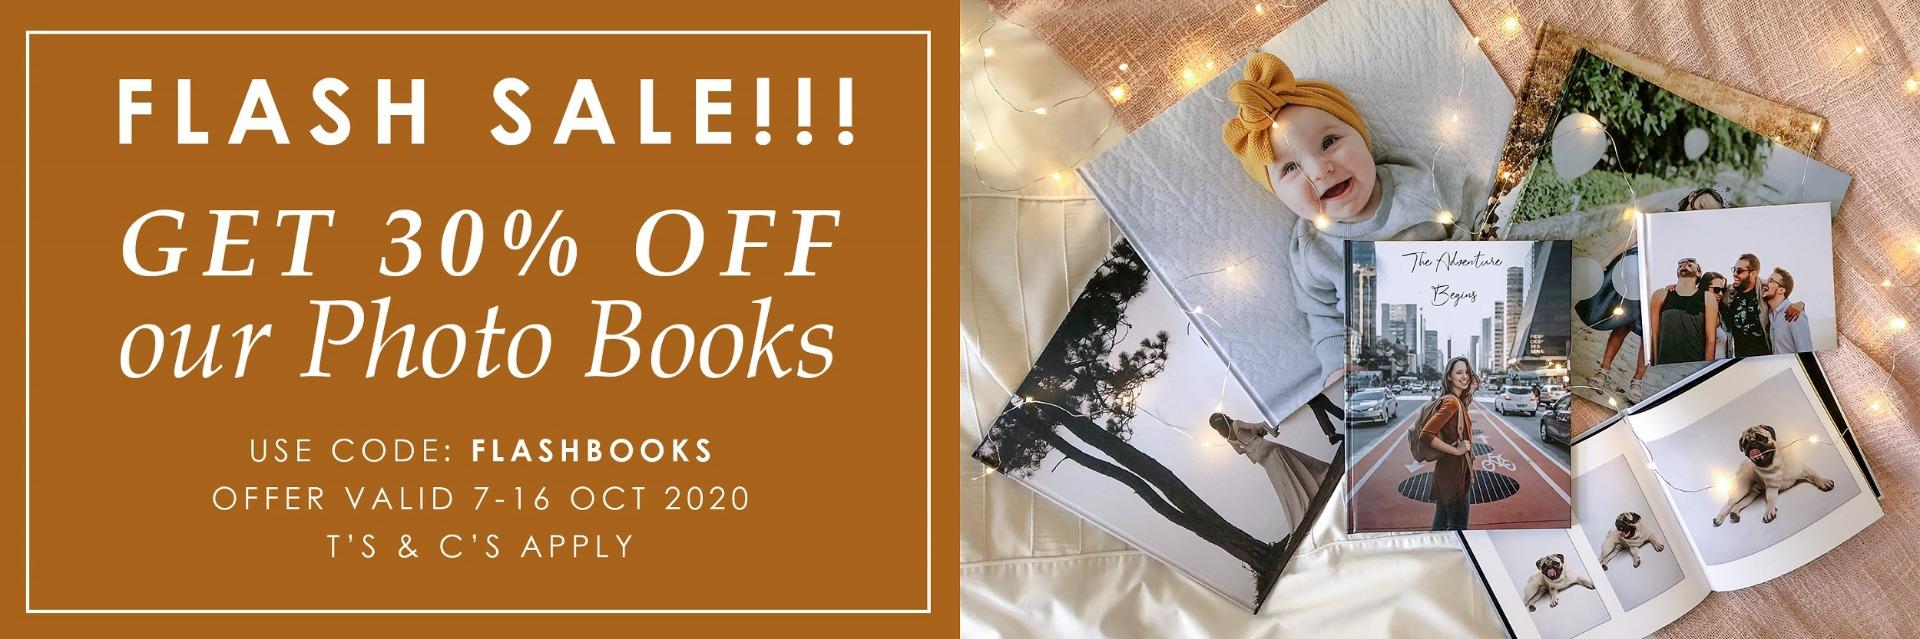 Flash Sale 30% Off Photo Books